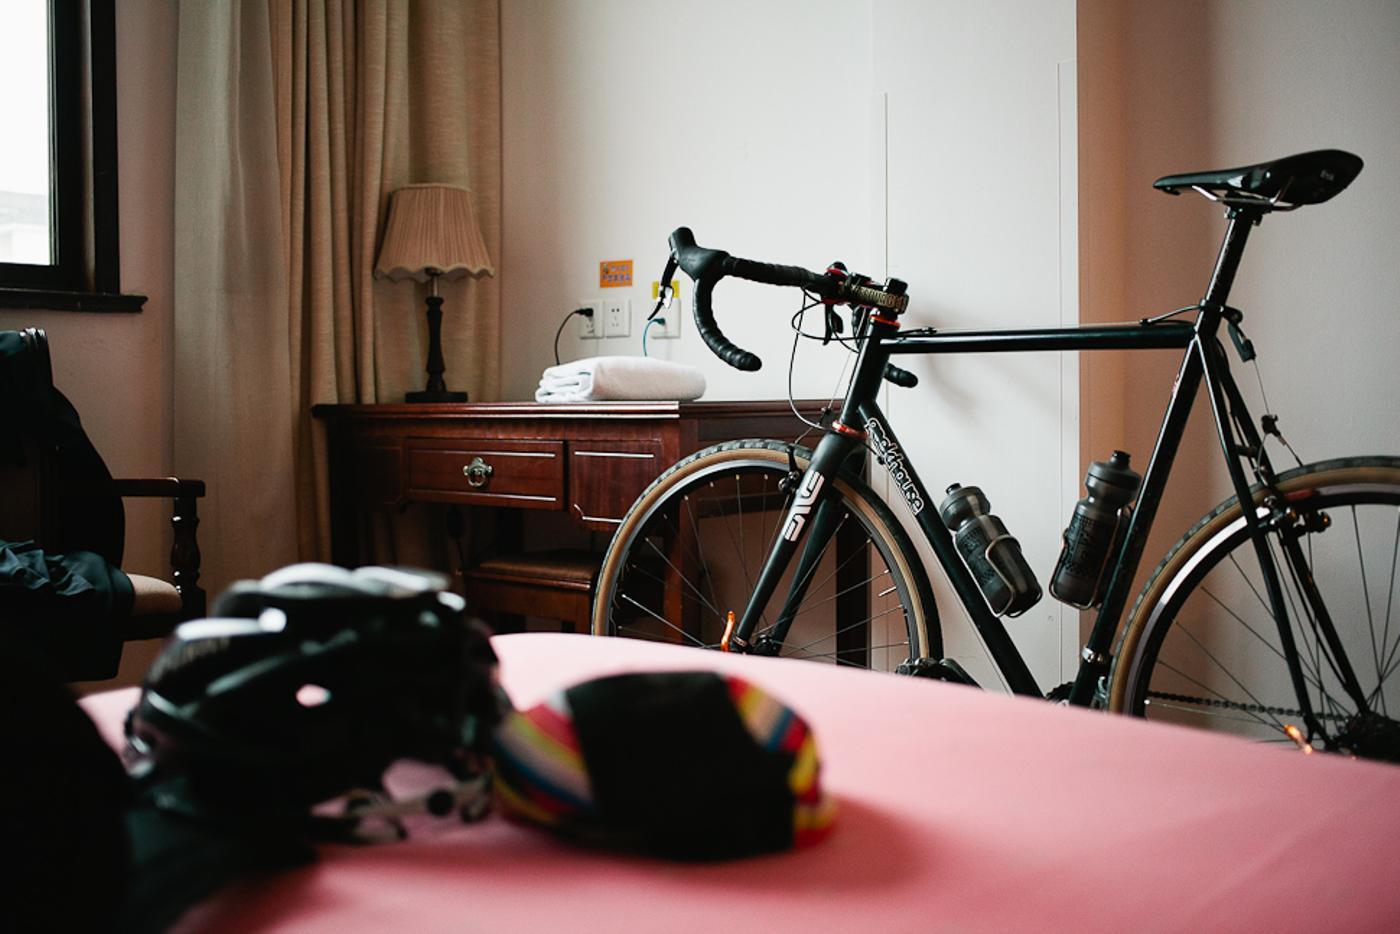 Mission Workshop _ PiNP Bike Tour: Day 01